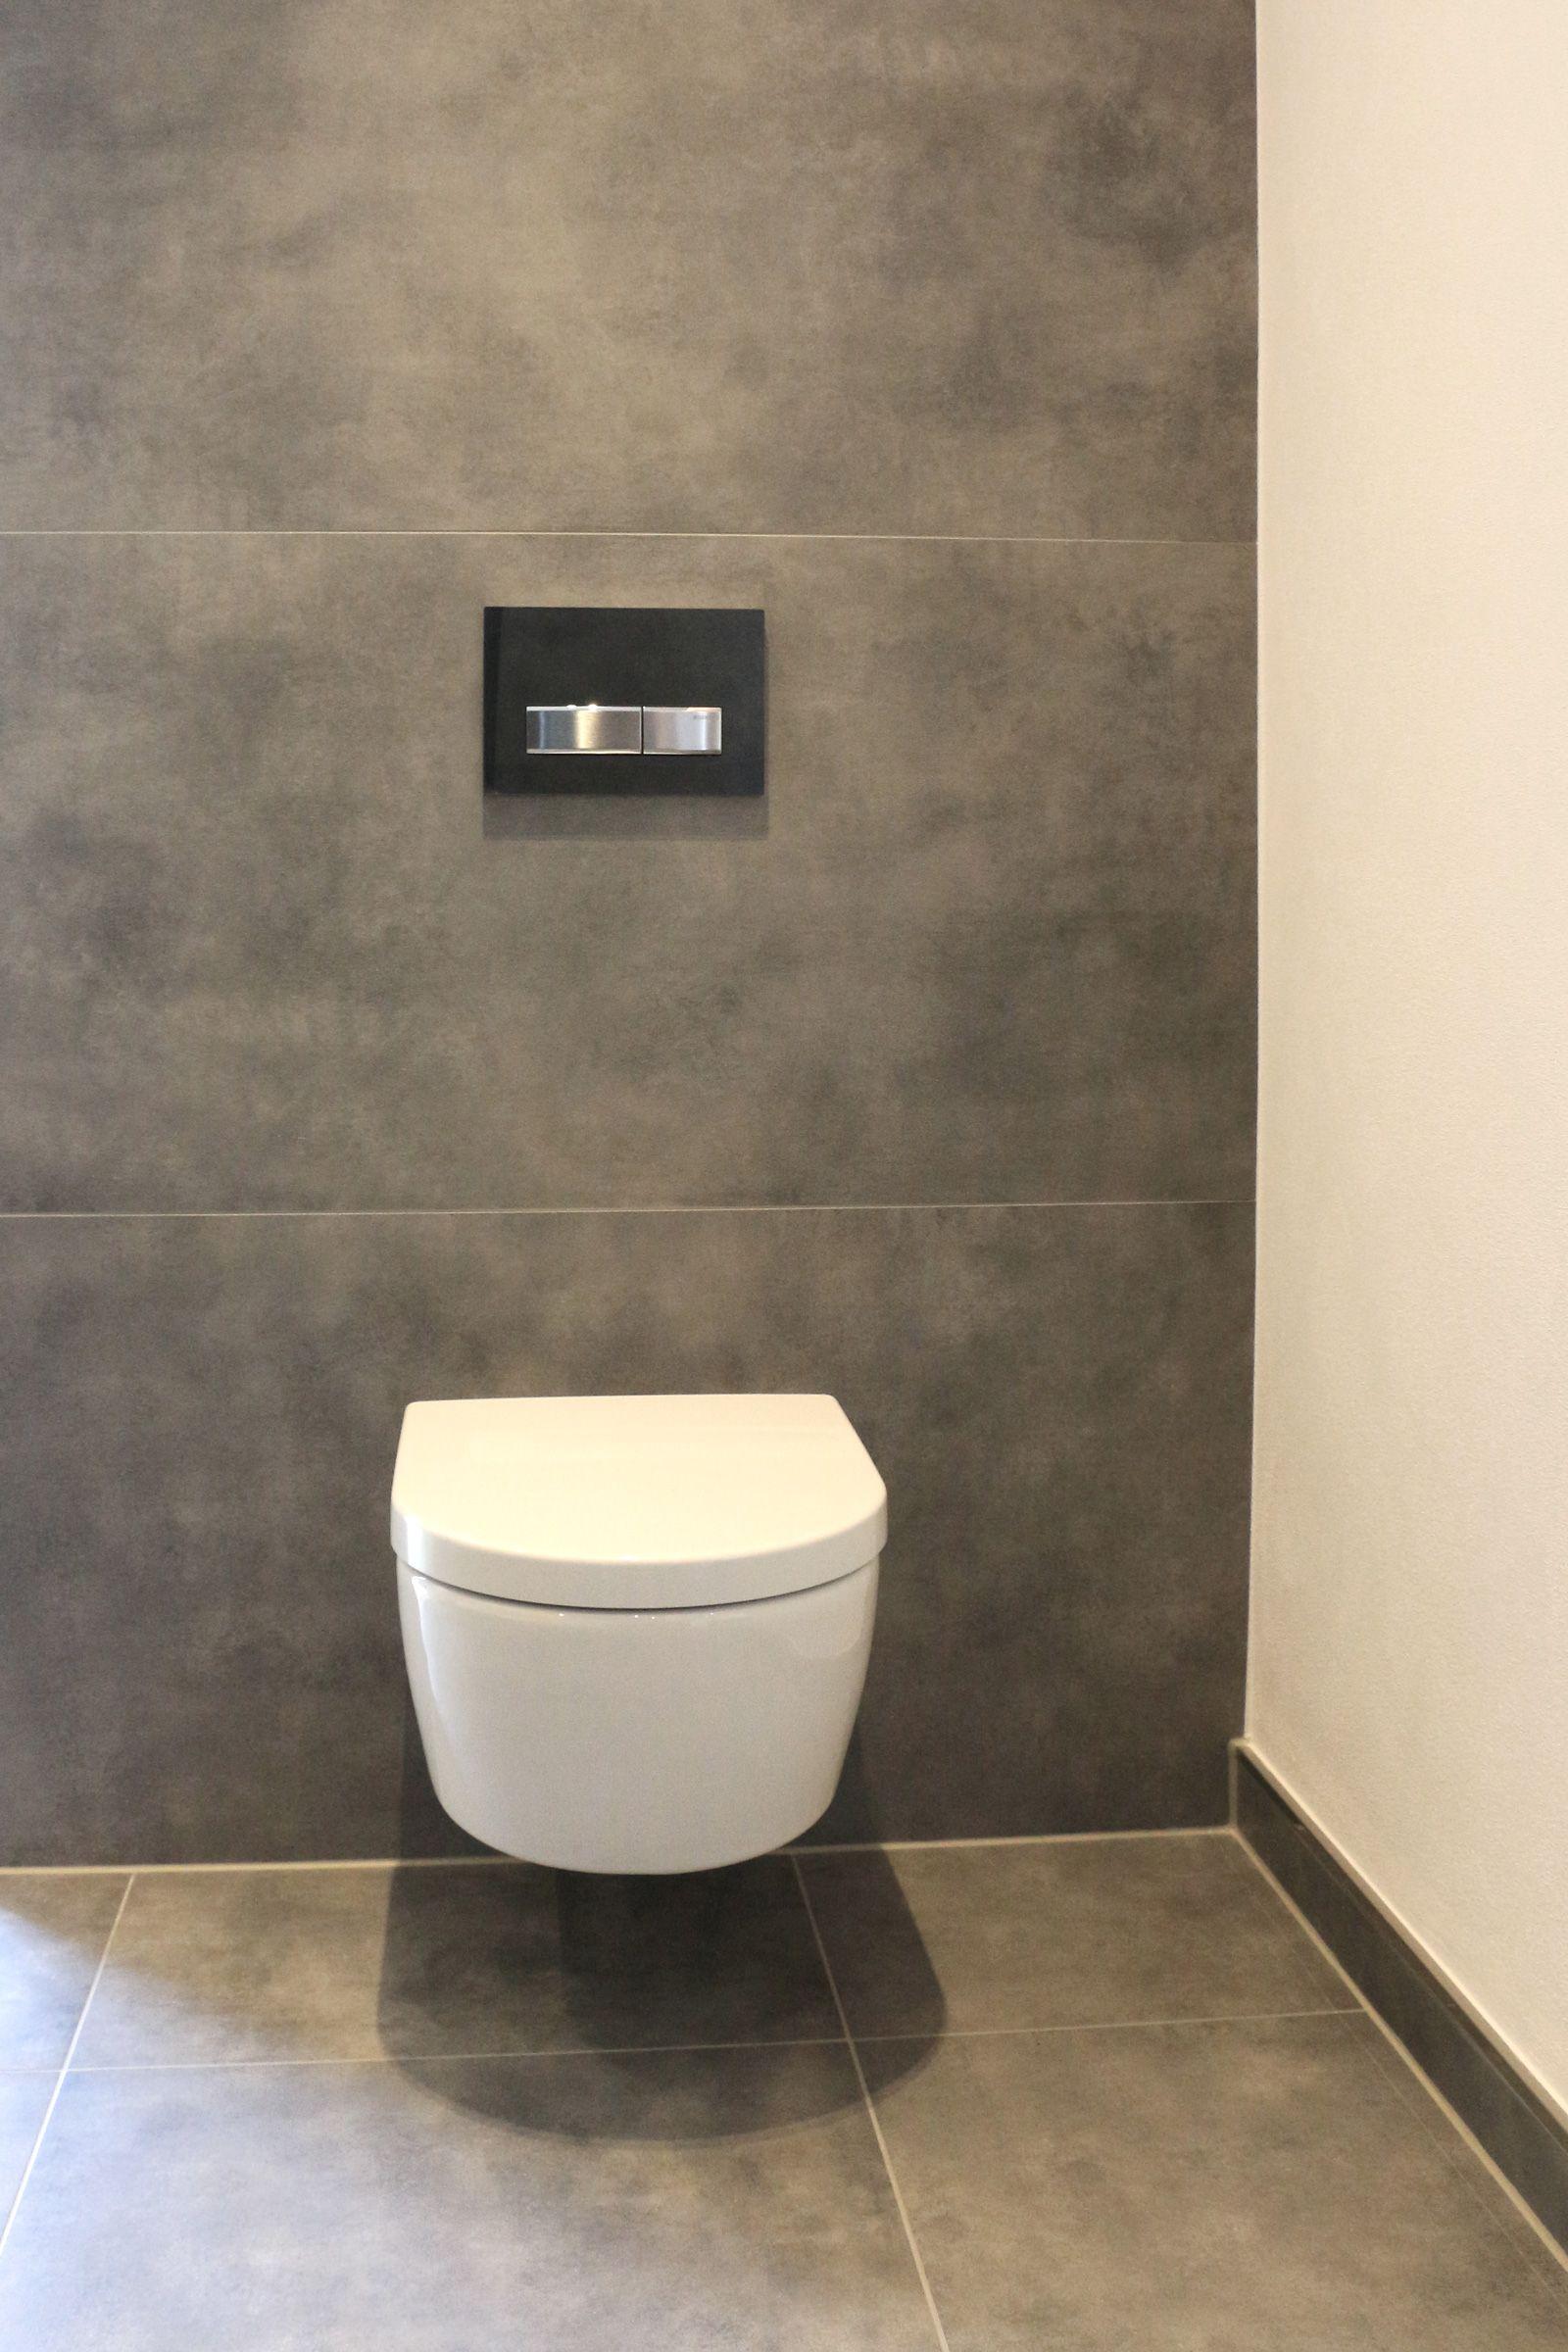 Betonoptik Klassisch Modern Fliesen Tiles Tegel Badezimmer Bathroom Badkamer Toilette Druckerplatte Wc Gastewc Ba Bodenfliese Betonoptik Wc Fliesen